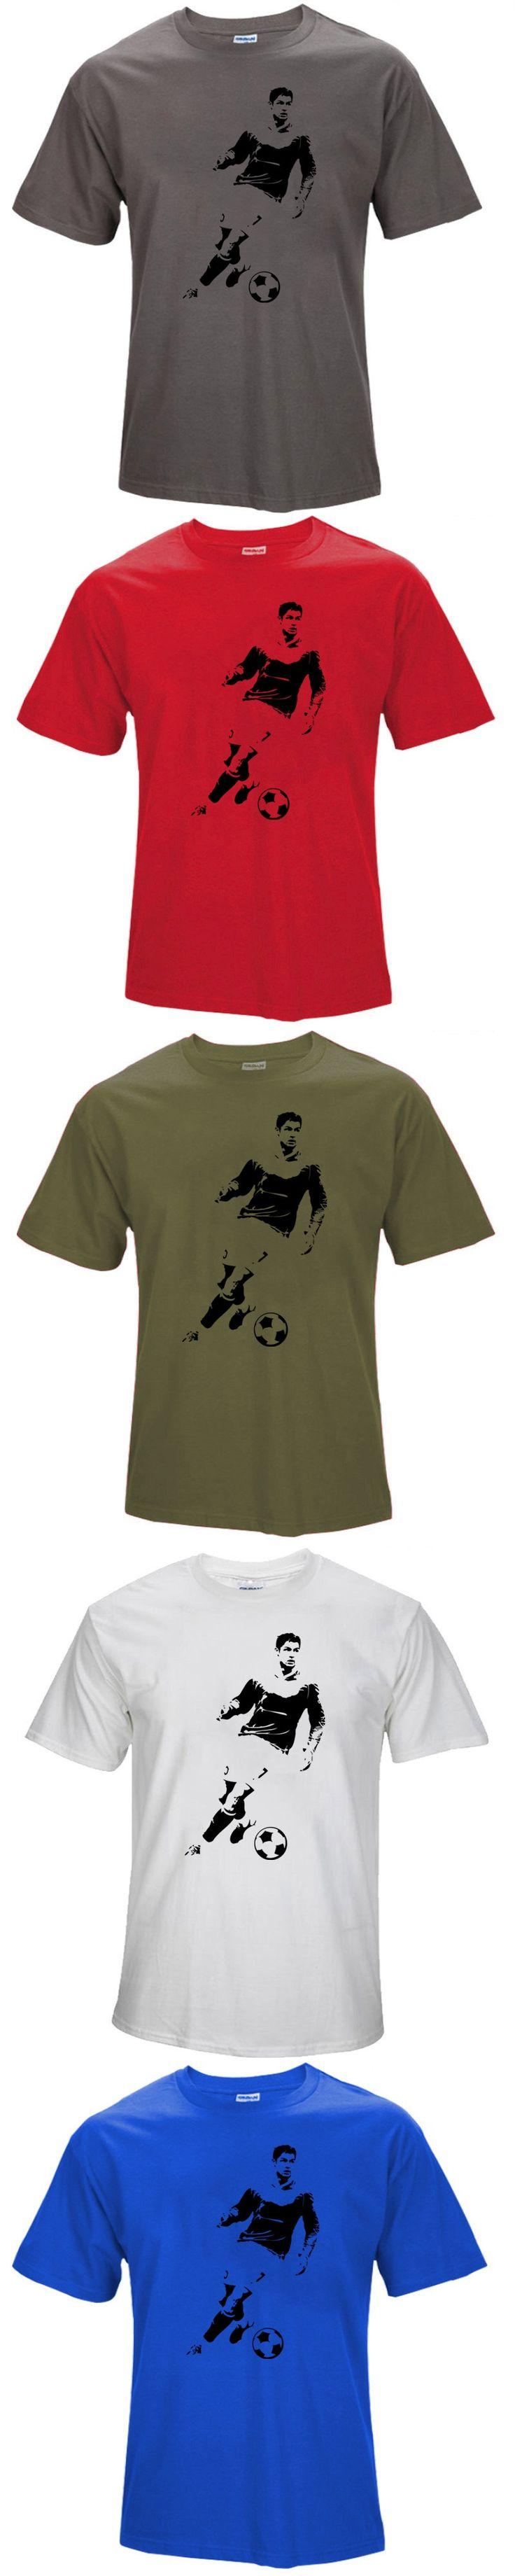 2016 Summer World Cup Cristiano Ronaldo Men's T-Shirt 2017 Camiseta Barcelonae Barcelona Casual Cotton T Shirt  S172